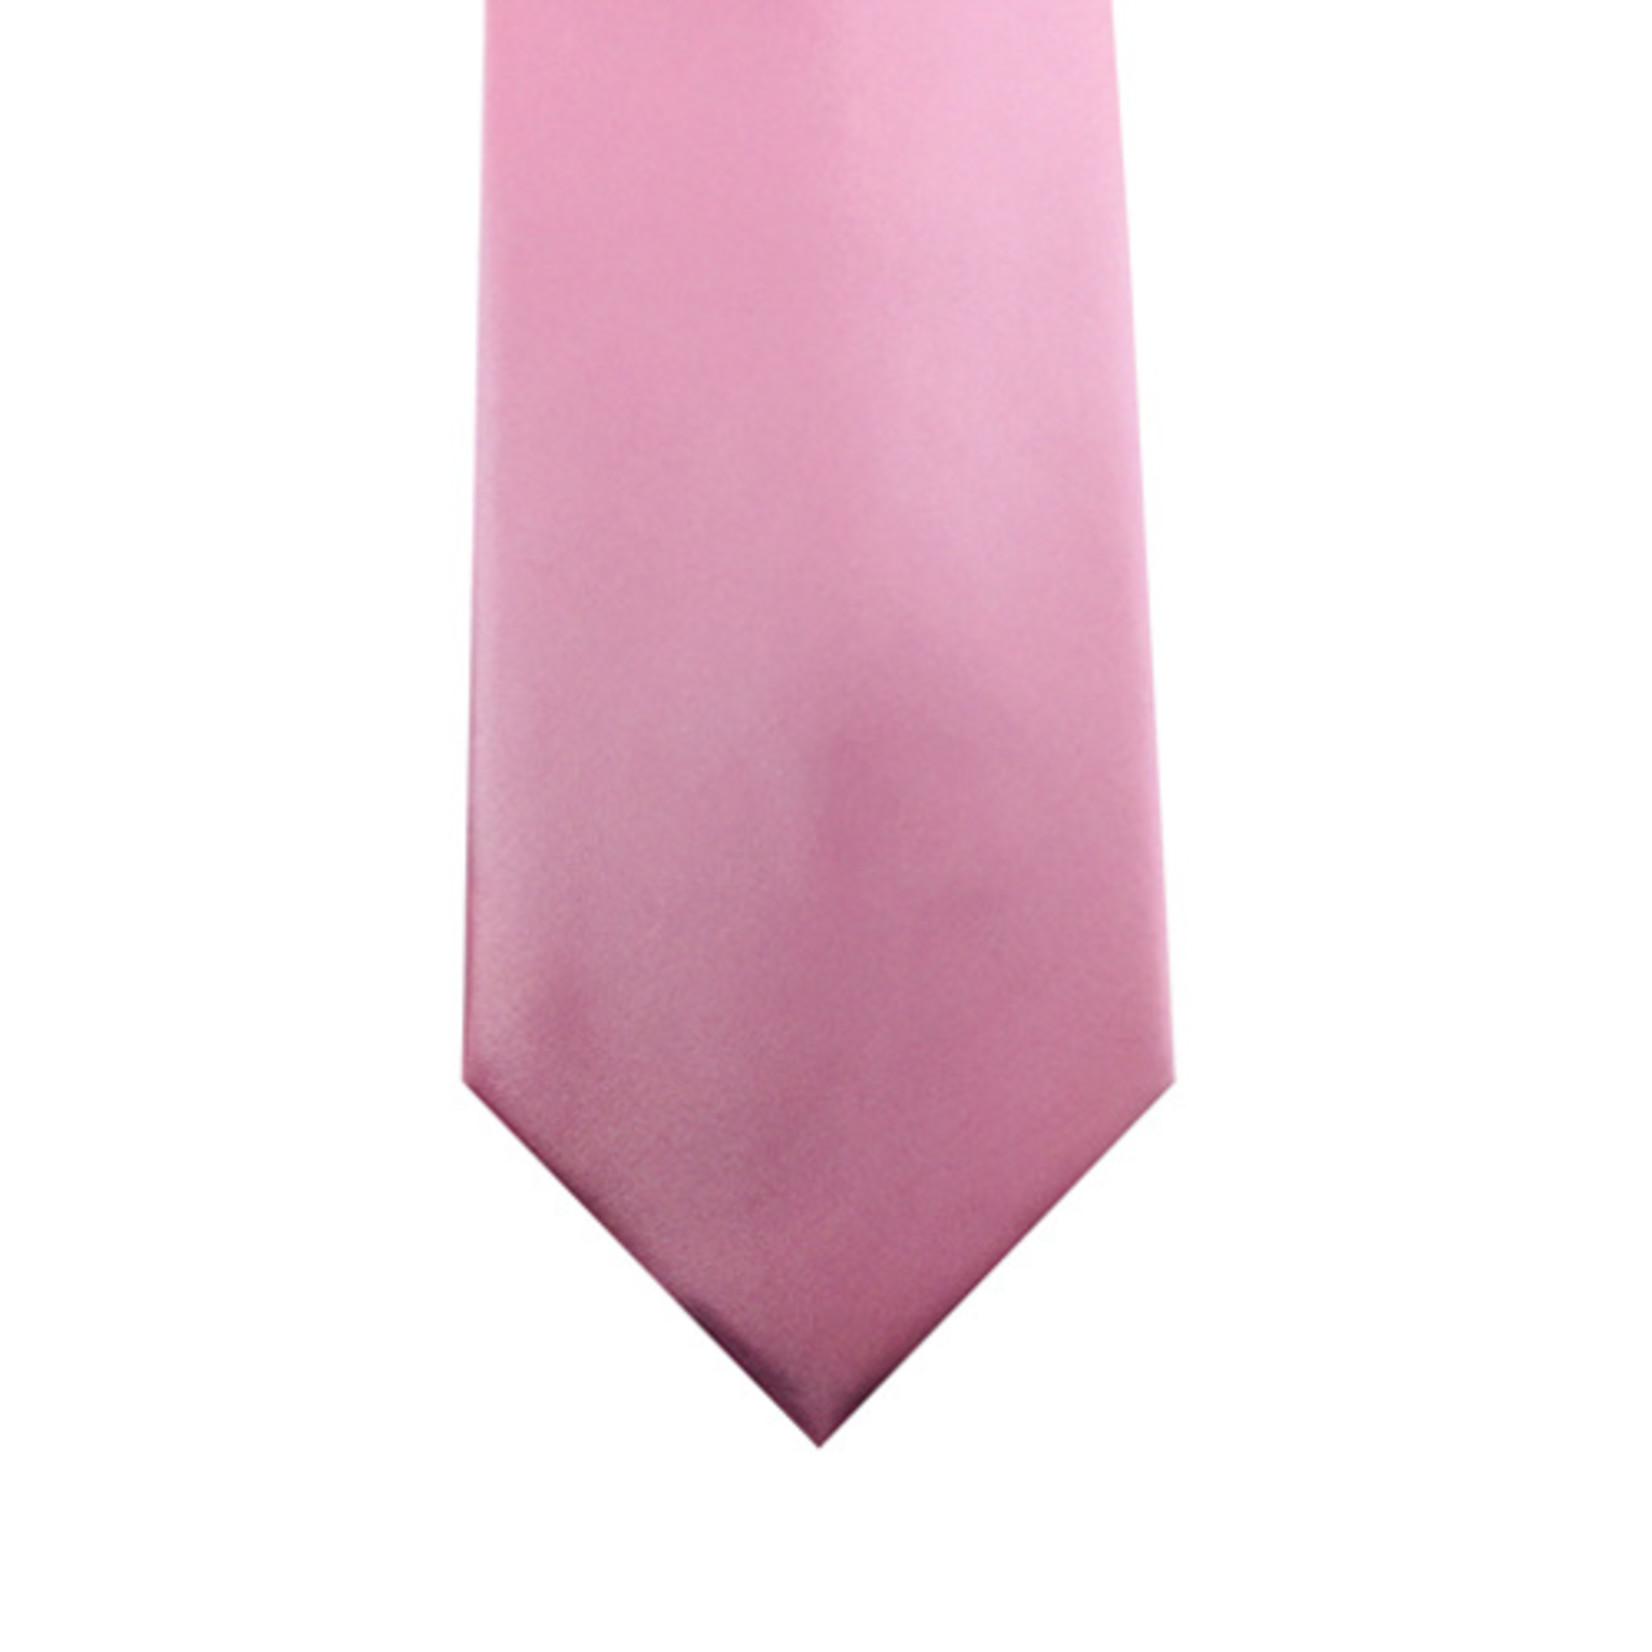 Knotz M100-42 Solid Light Pink Tie